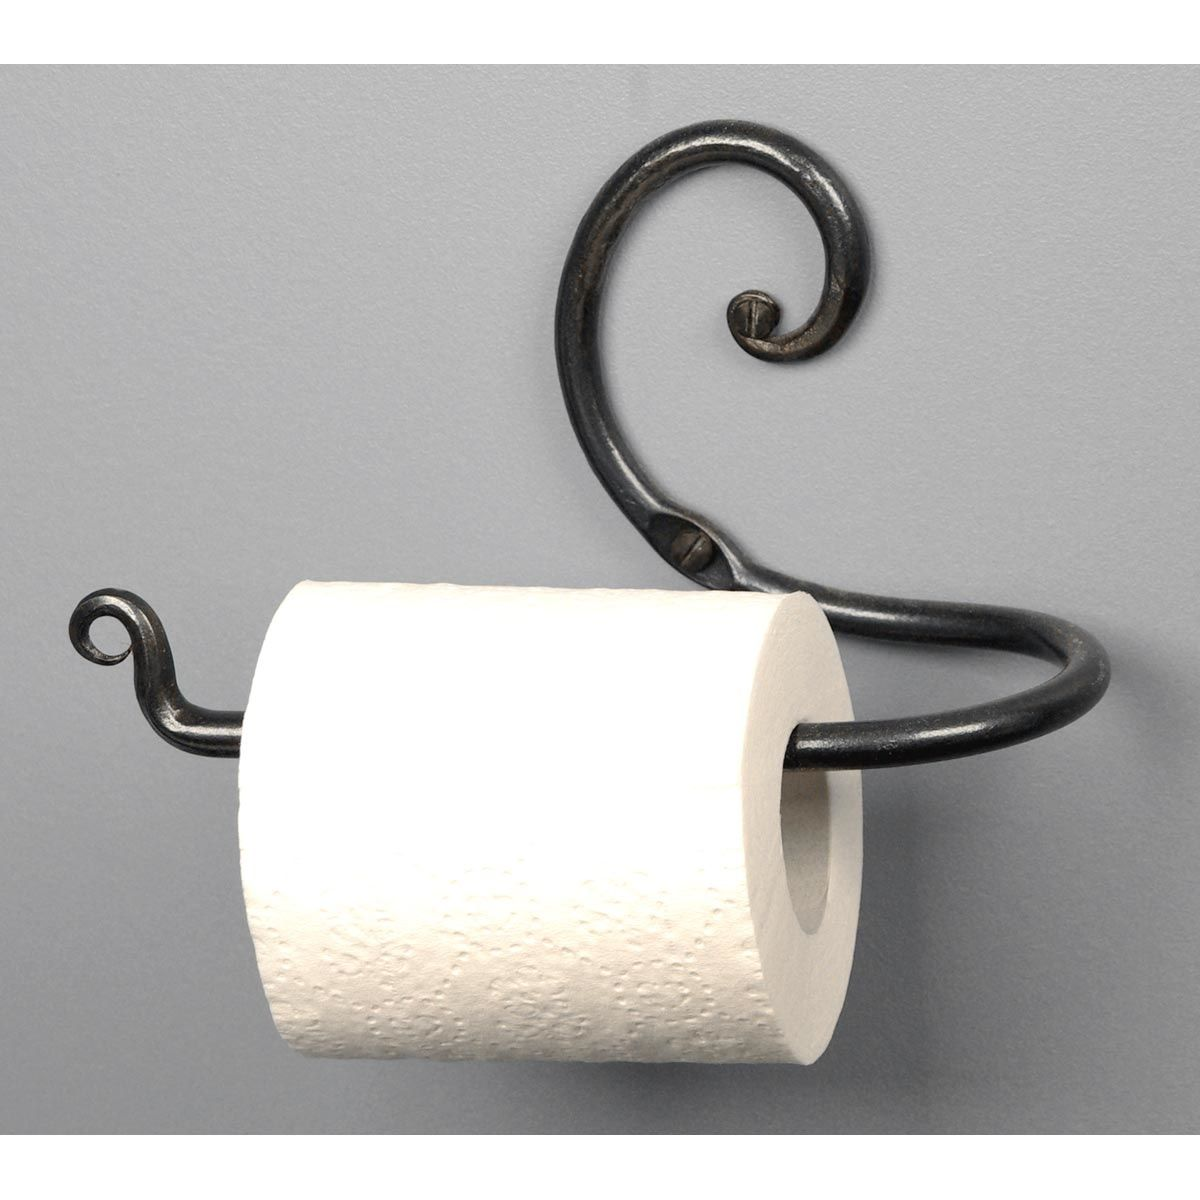 Image result for bathroom accessories toilet paper holders australia ...